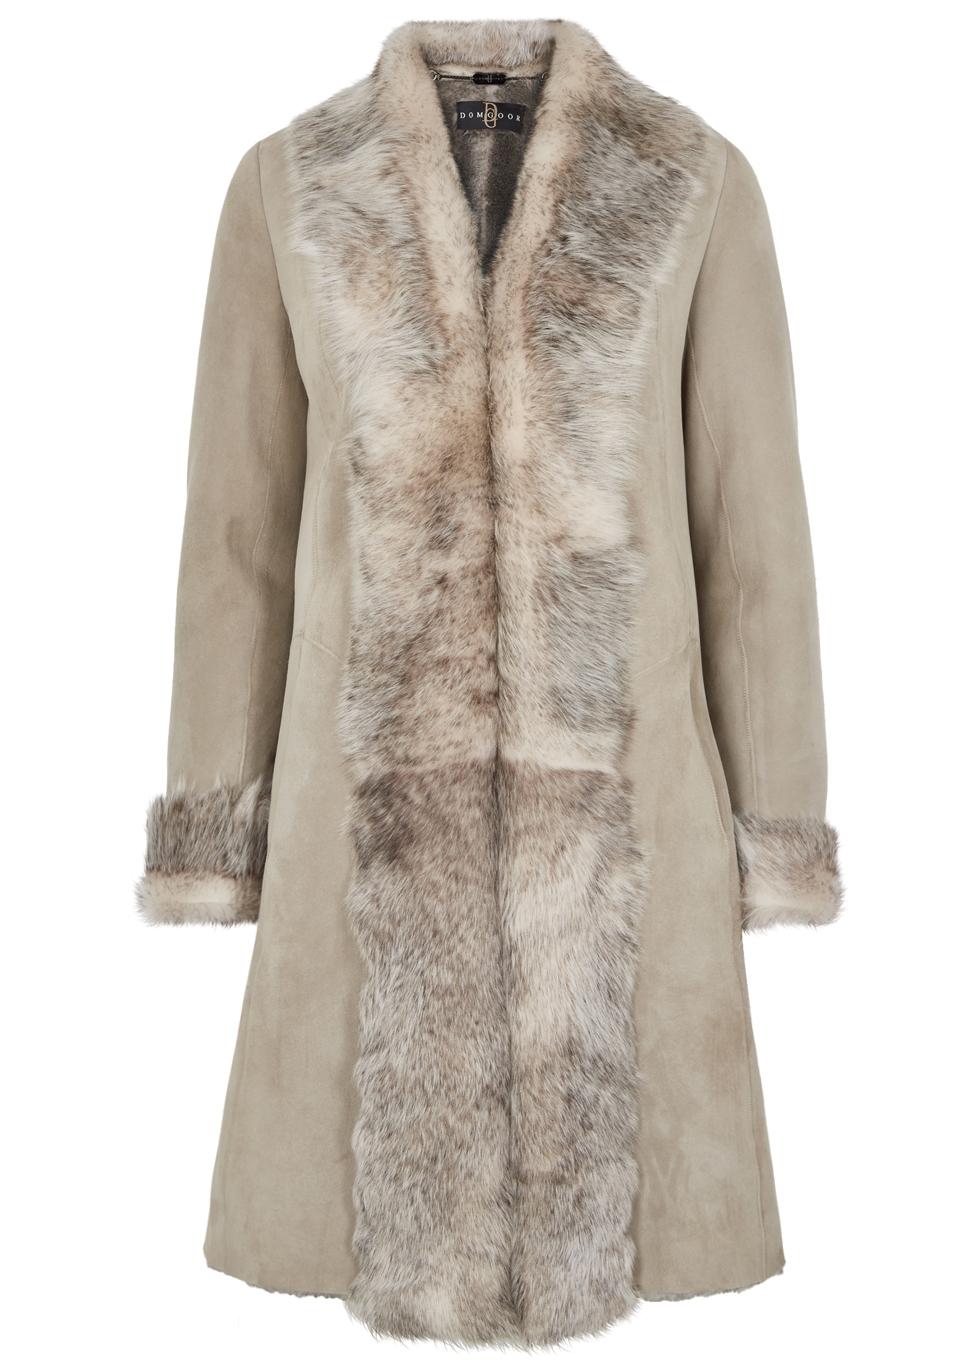 DOM GOOR Light Grey Fur-Trimmed Shearling Coat